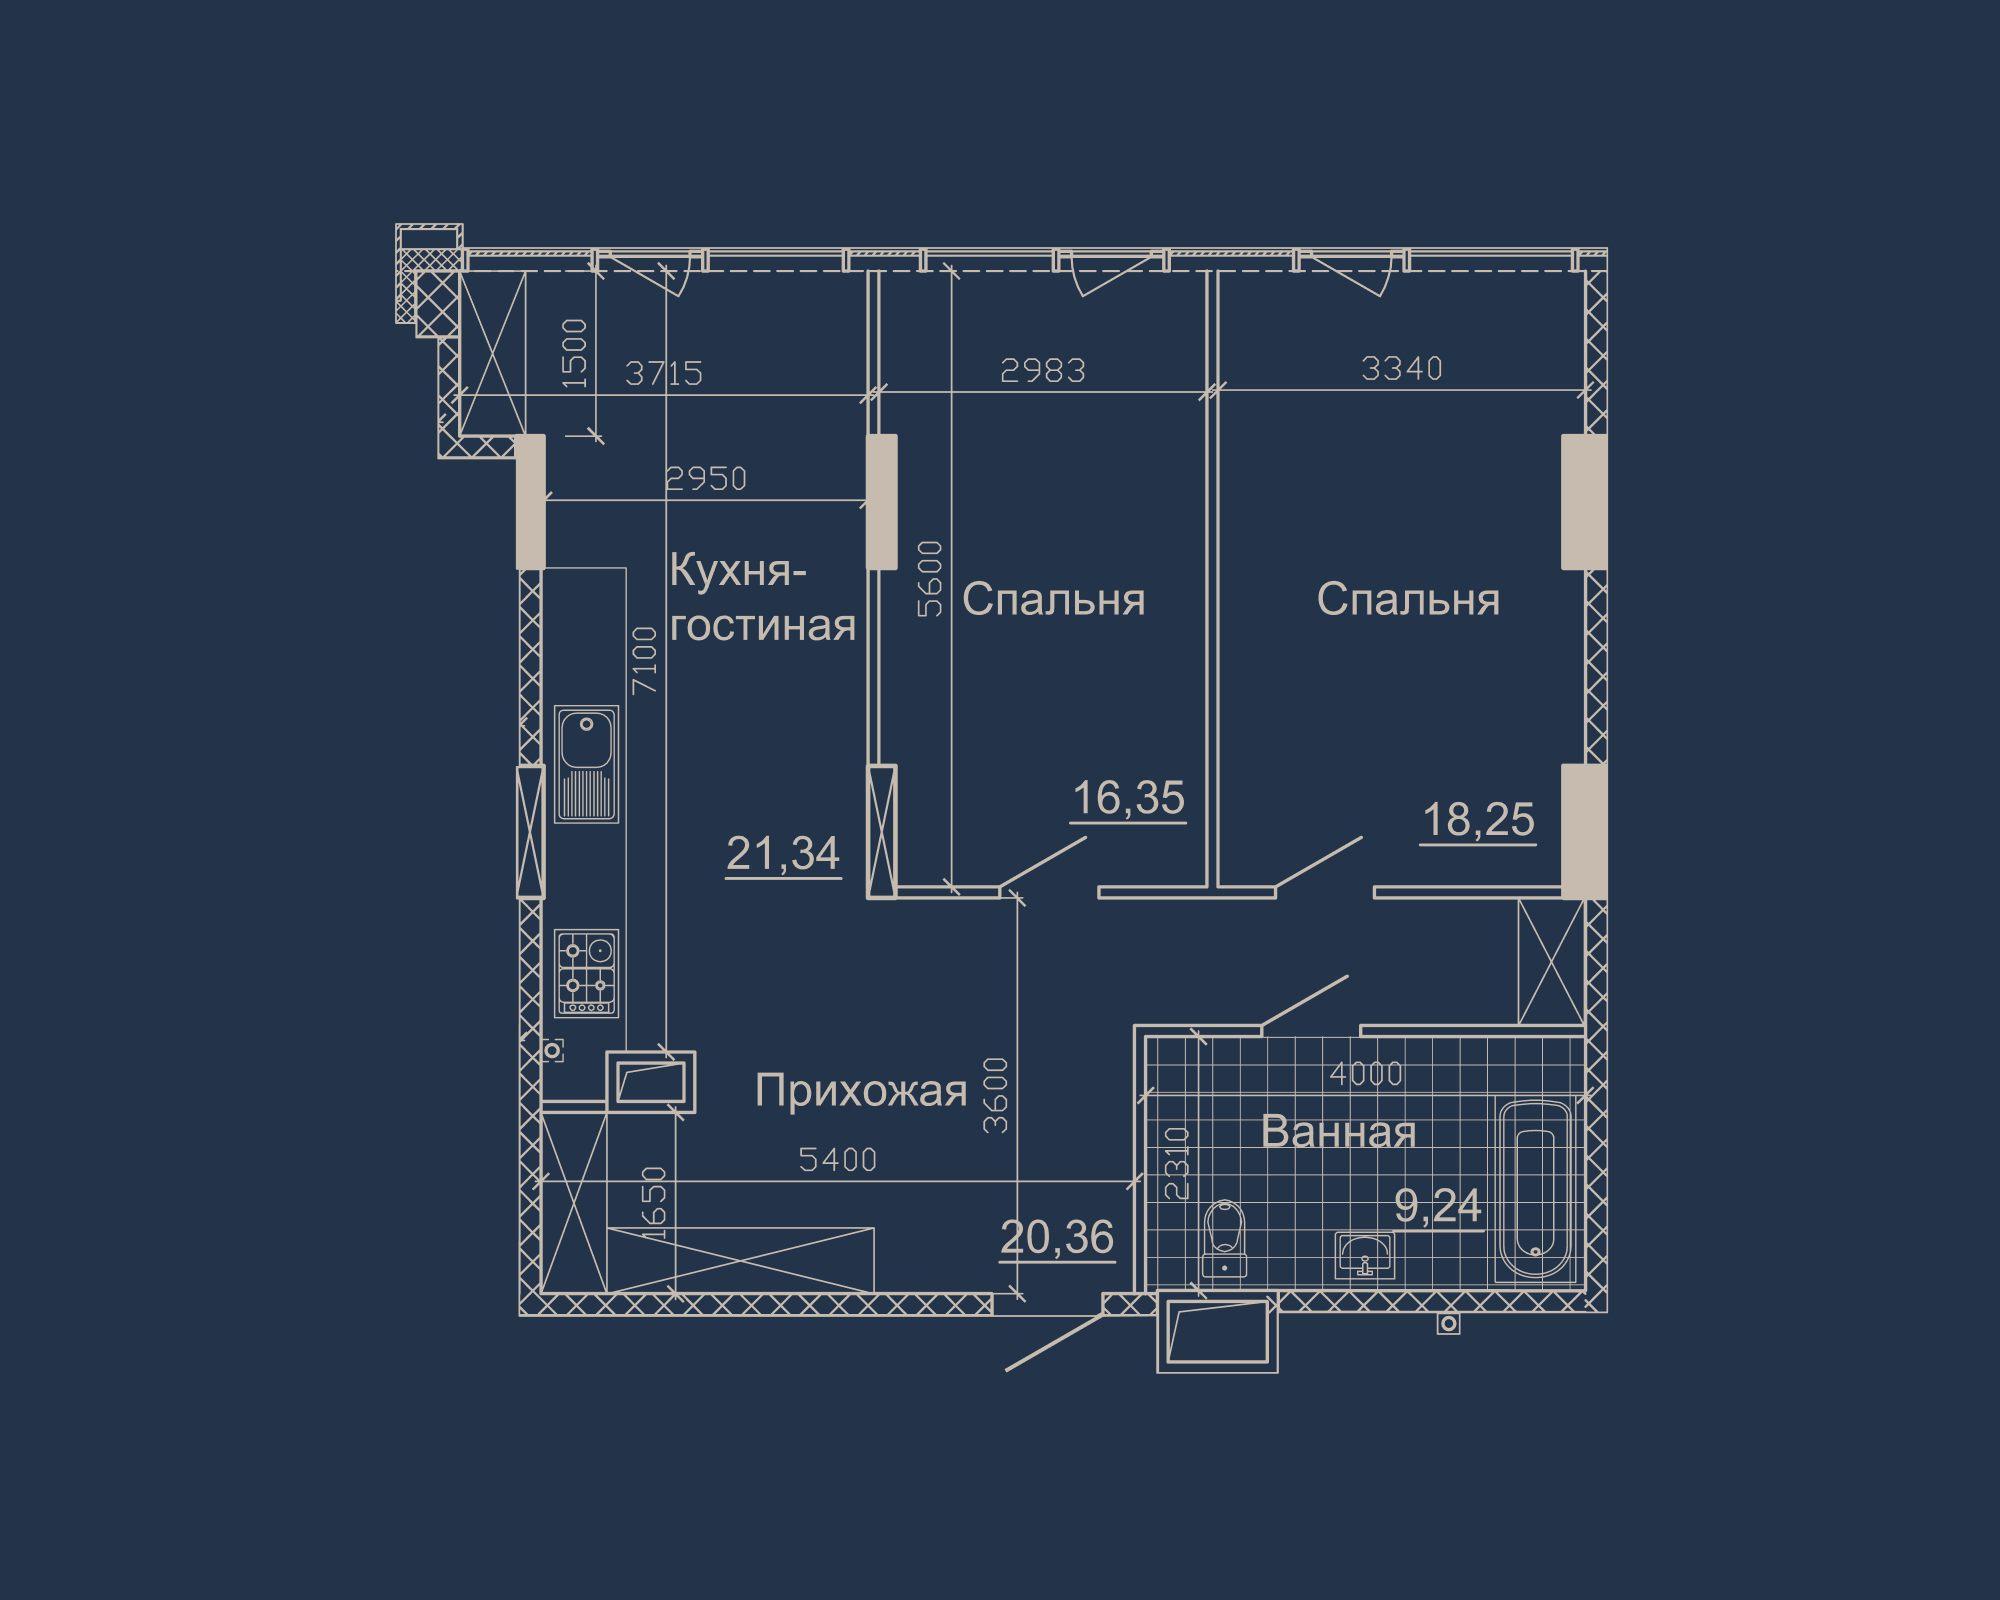 2-кімнатна квартира типу 11А-1 у ЖК Nebo